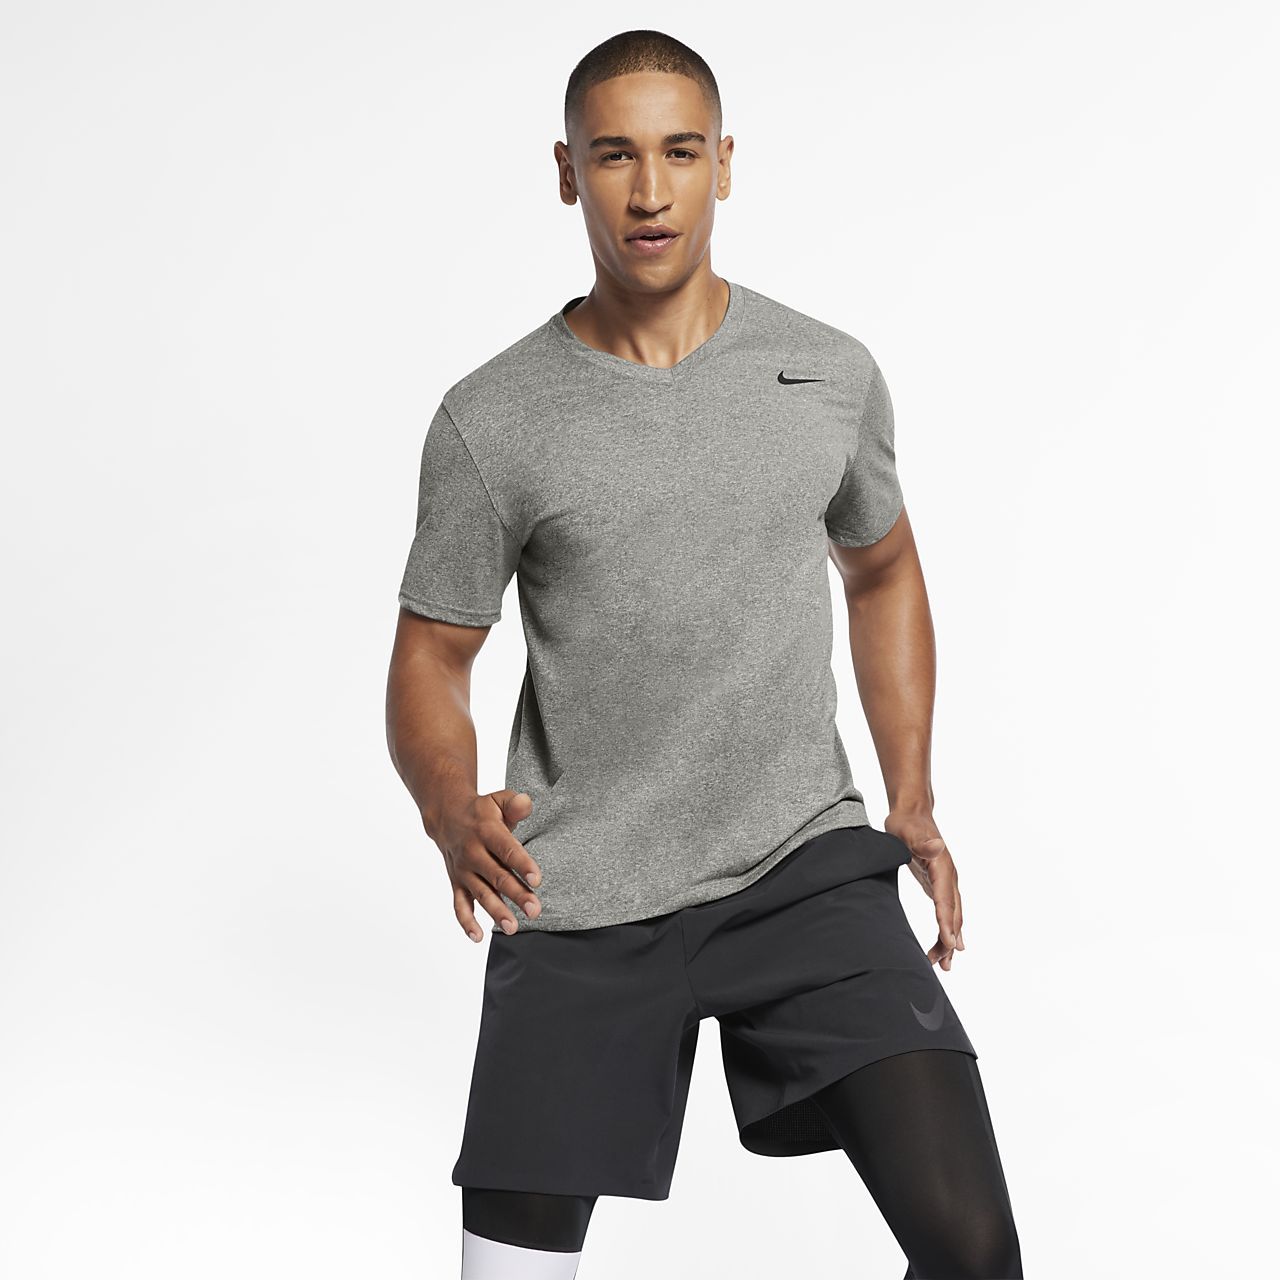 black and grey nike shirt